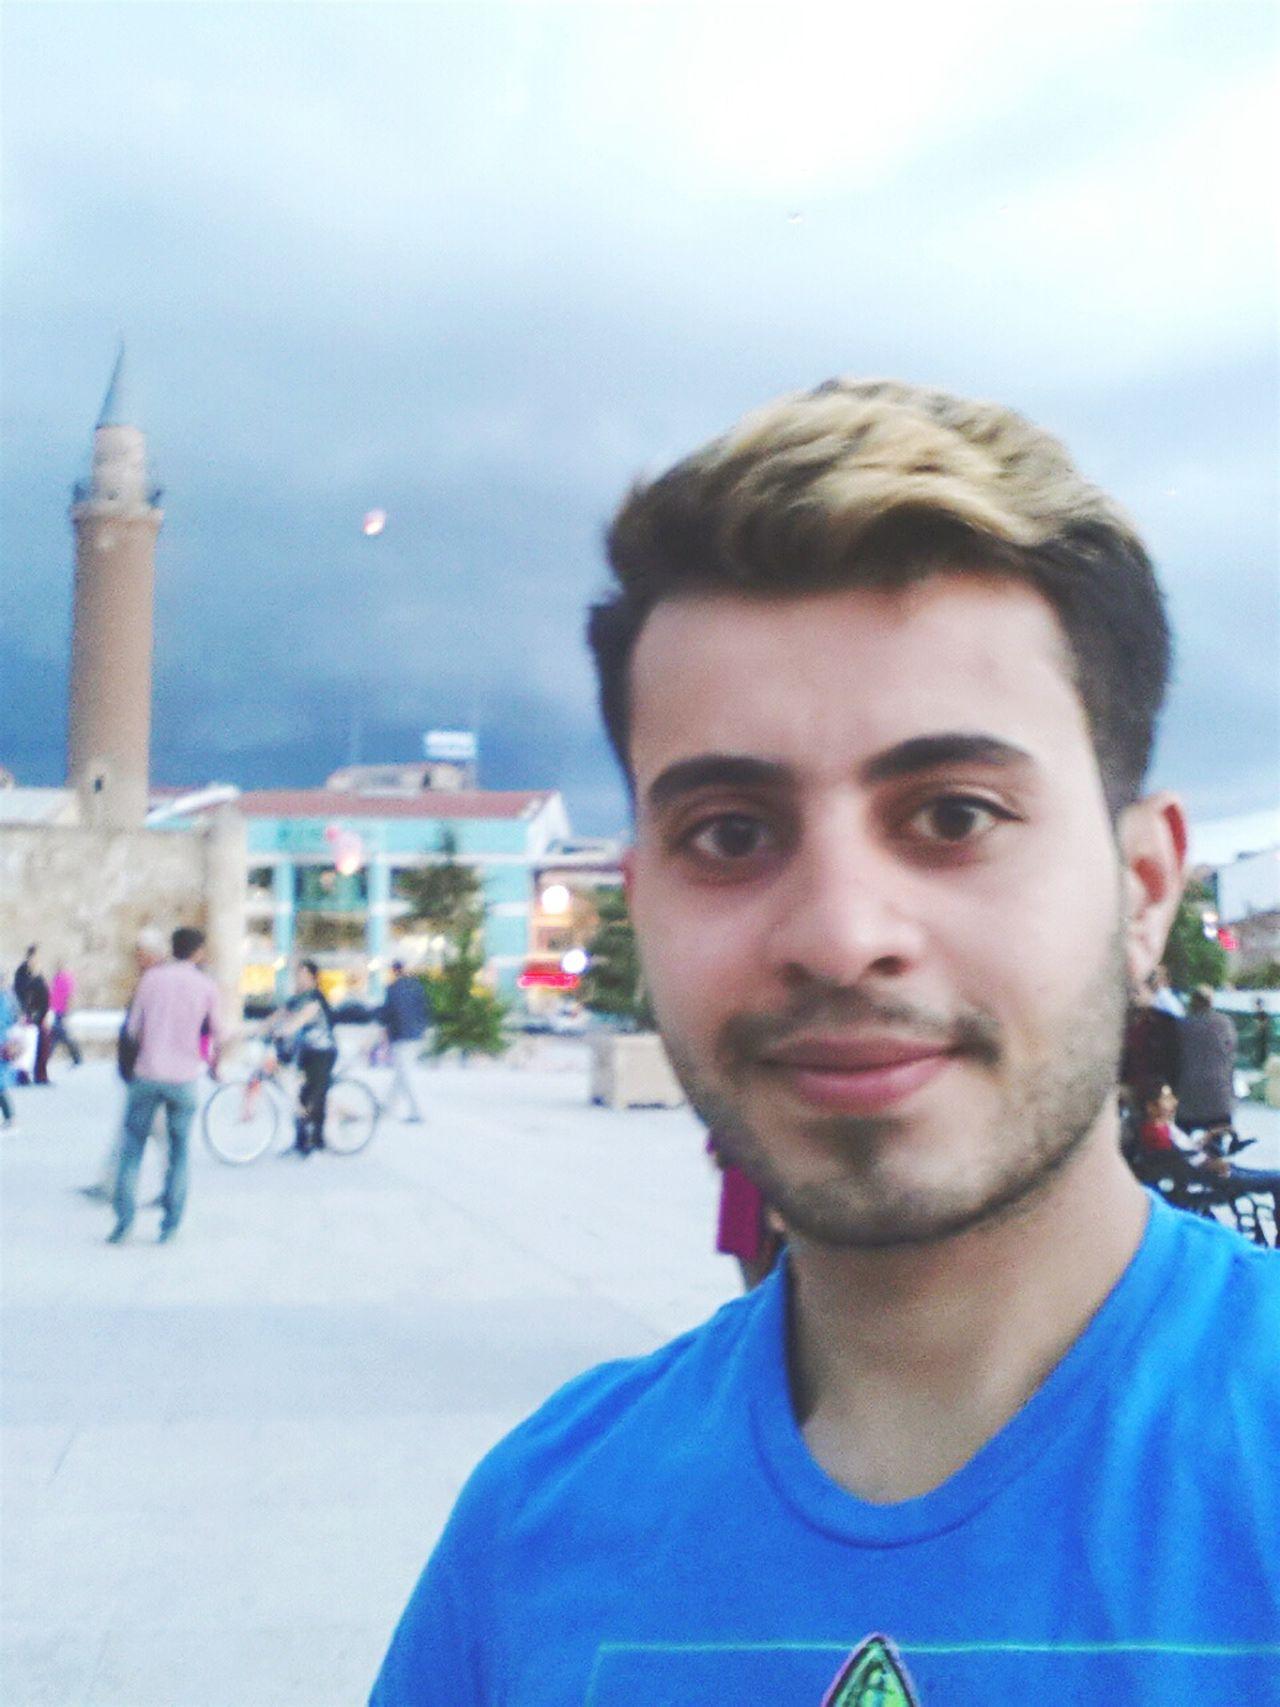 Kırşehir Selfie Sexyselfie Relaxing Taking Photos Izmir Istanbul Kik Me